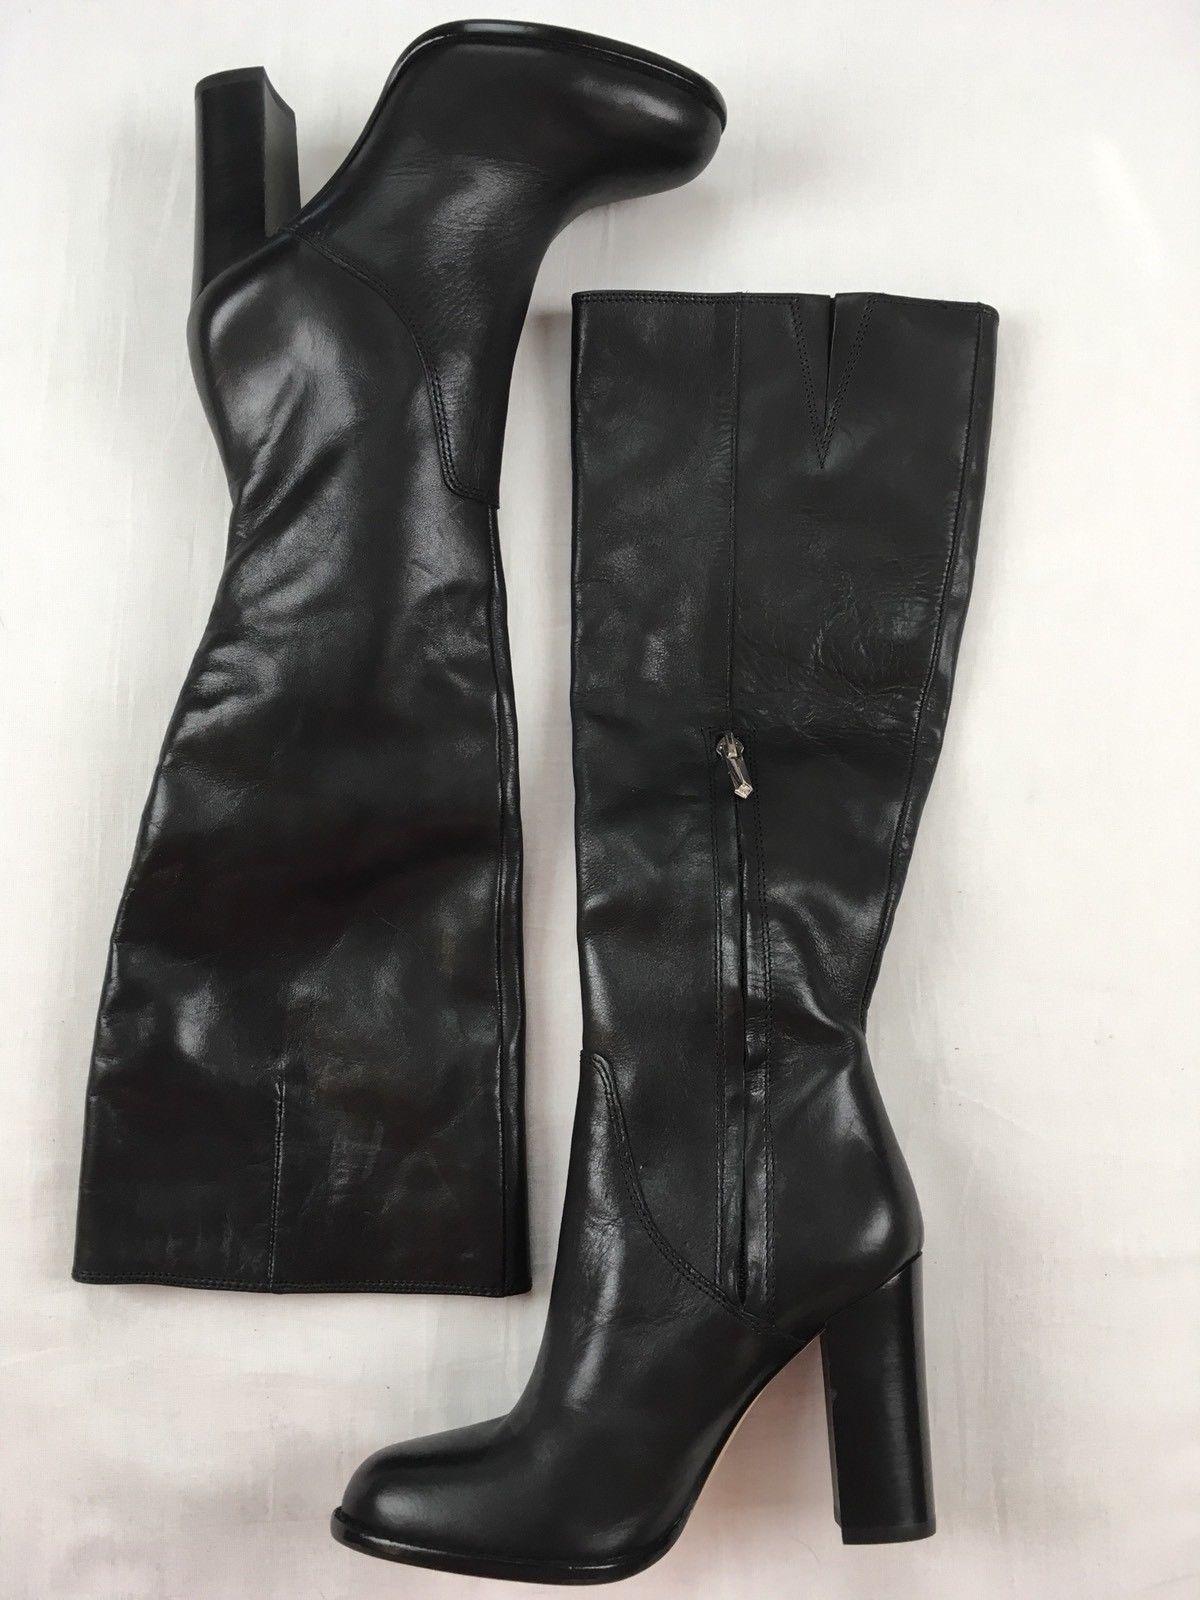 7cae4abbf SAM EDELMAN Sale New Regina Tall Knee High Heeled Leather Riding Boots  Black 5